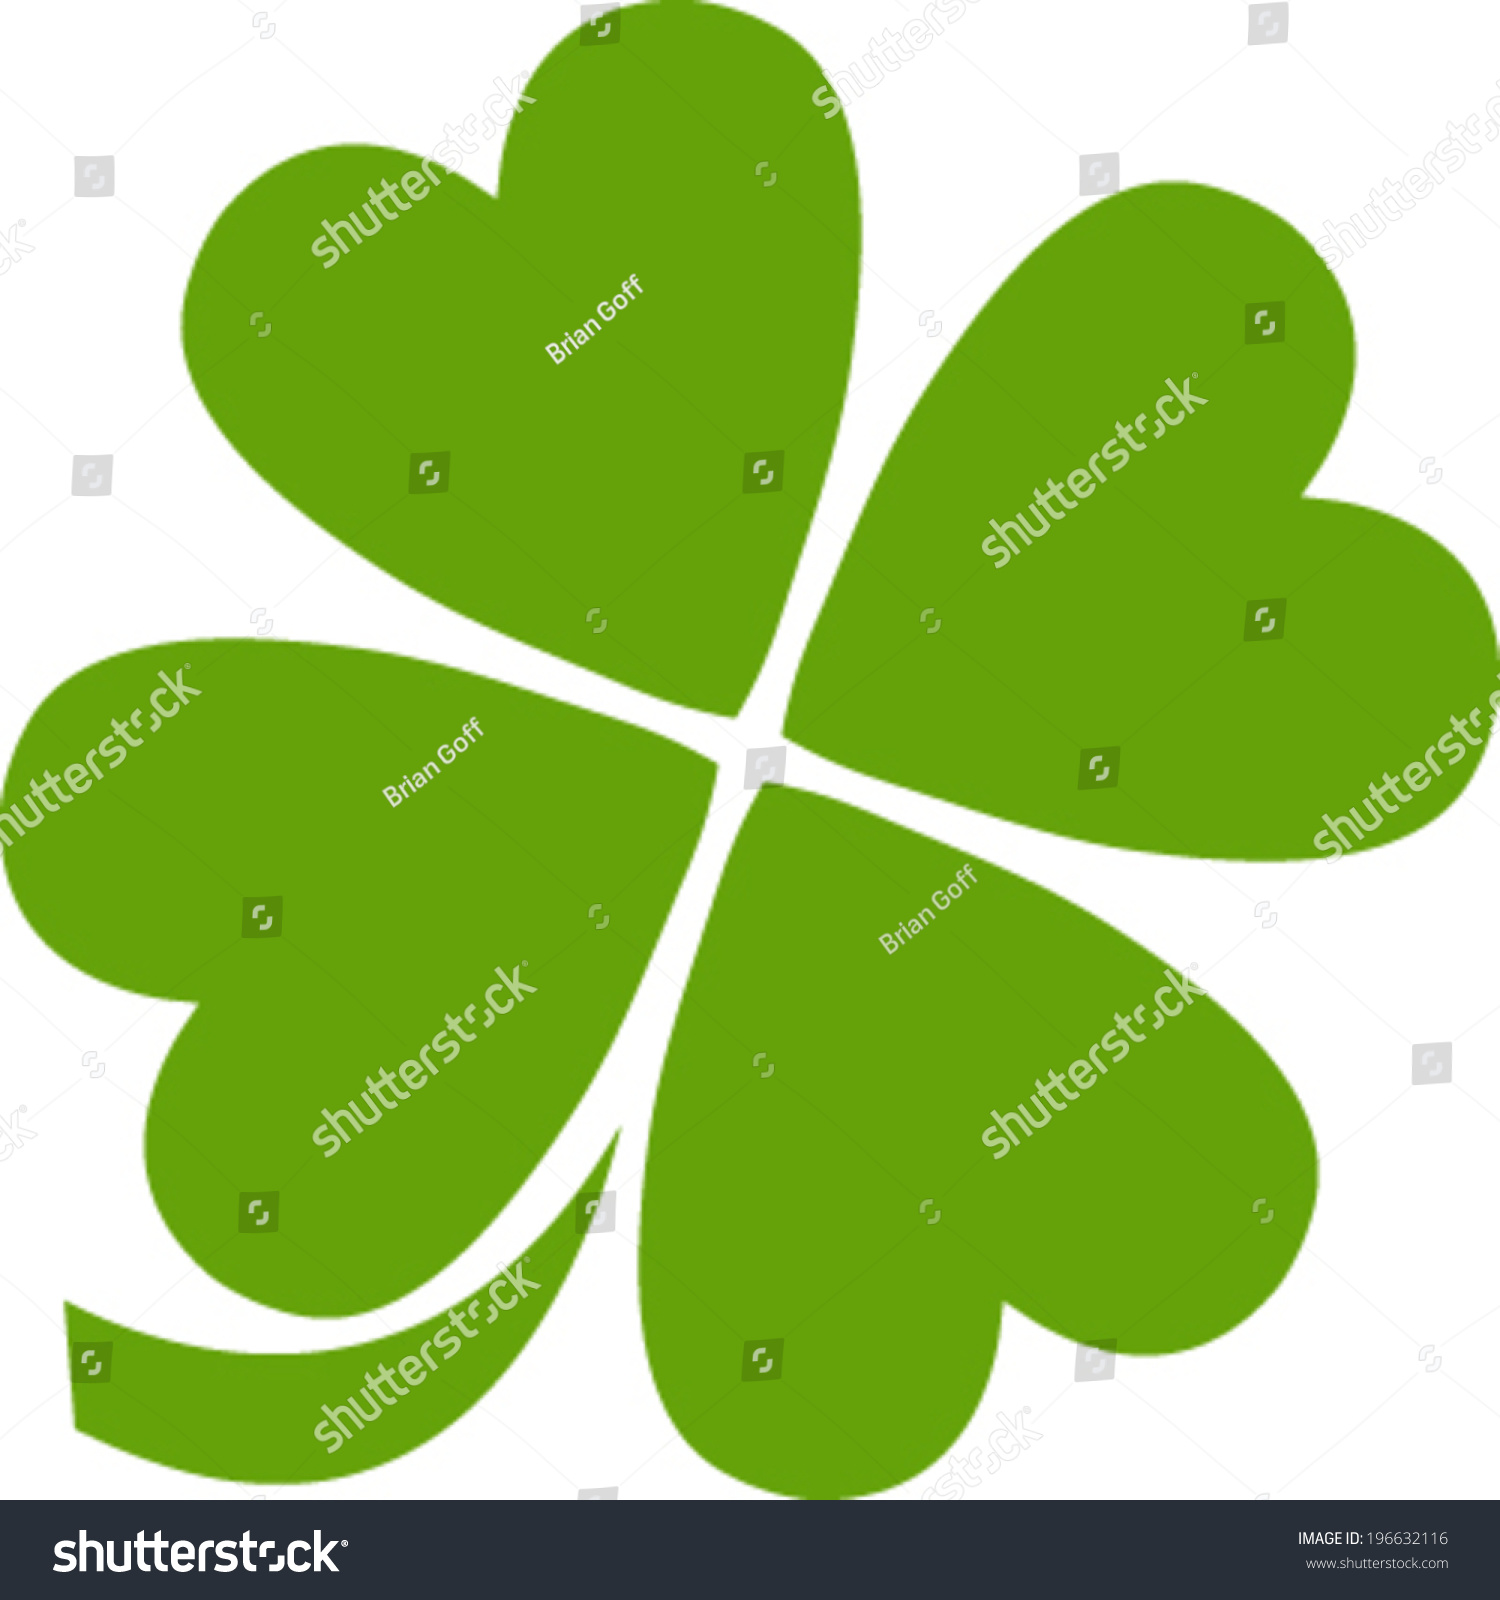 four leaf clover vector icon stock vector 196632116 shutterstock rh shutterstock com 4 leaf clover vector free download four-leaf clover vector free download